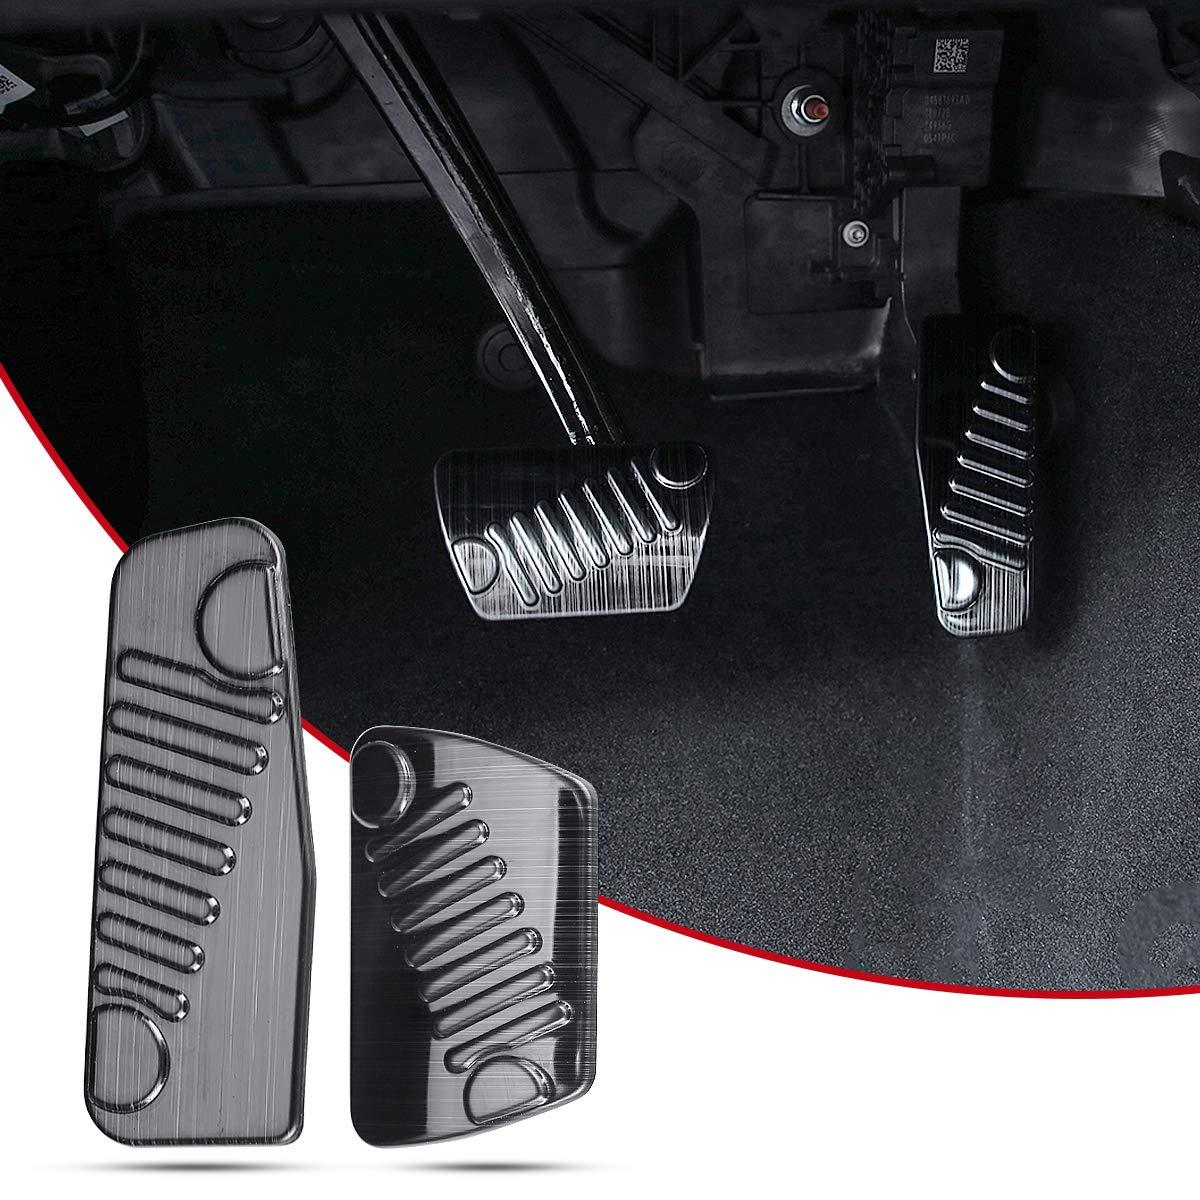 ZGBADMAN Stainless Steel Foot Pedal Set kit 2pcs//Set Black Auto Foot Pedal Pads Pedal Accelerator Brake Pad Trim Cover for Jeep Wrangler JL 2018